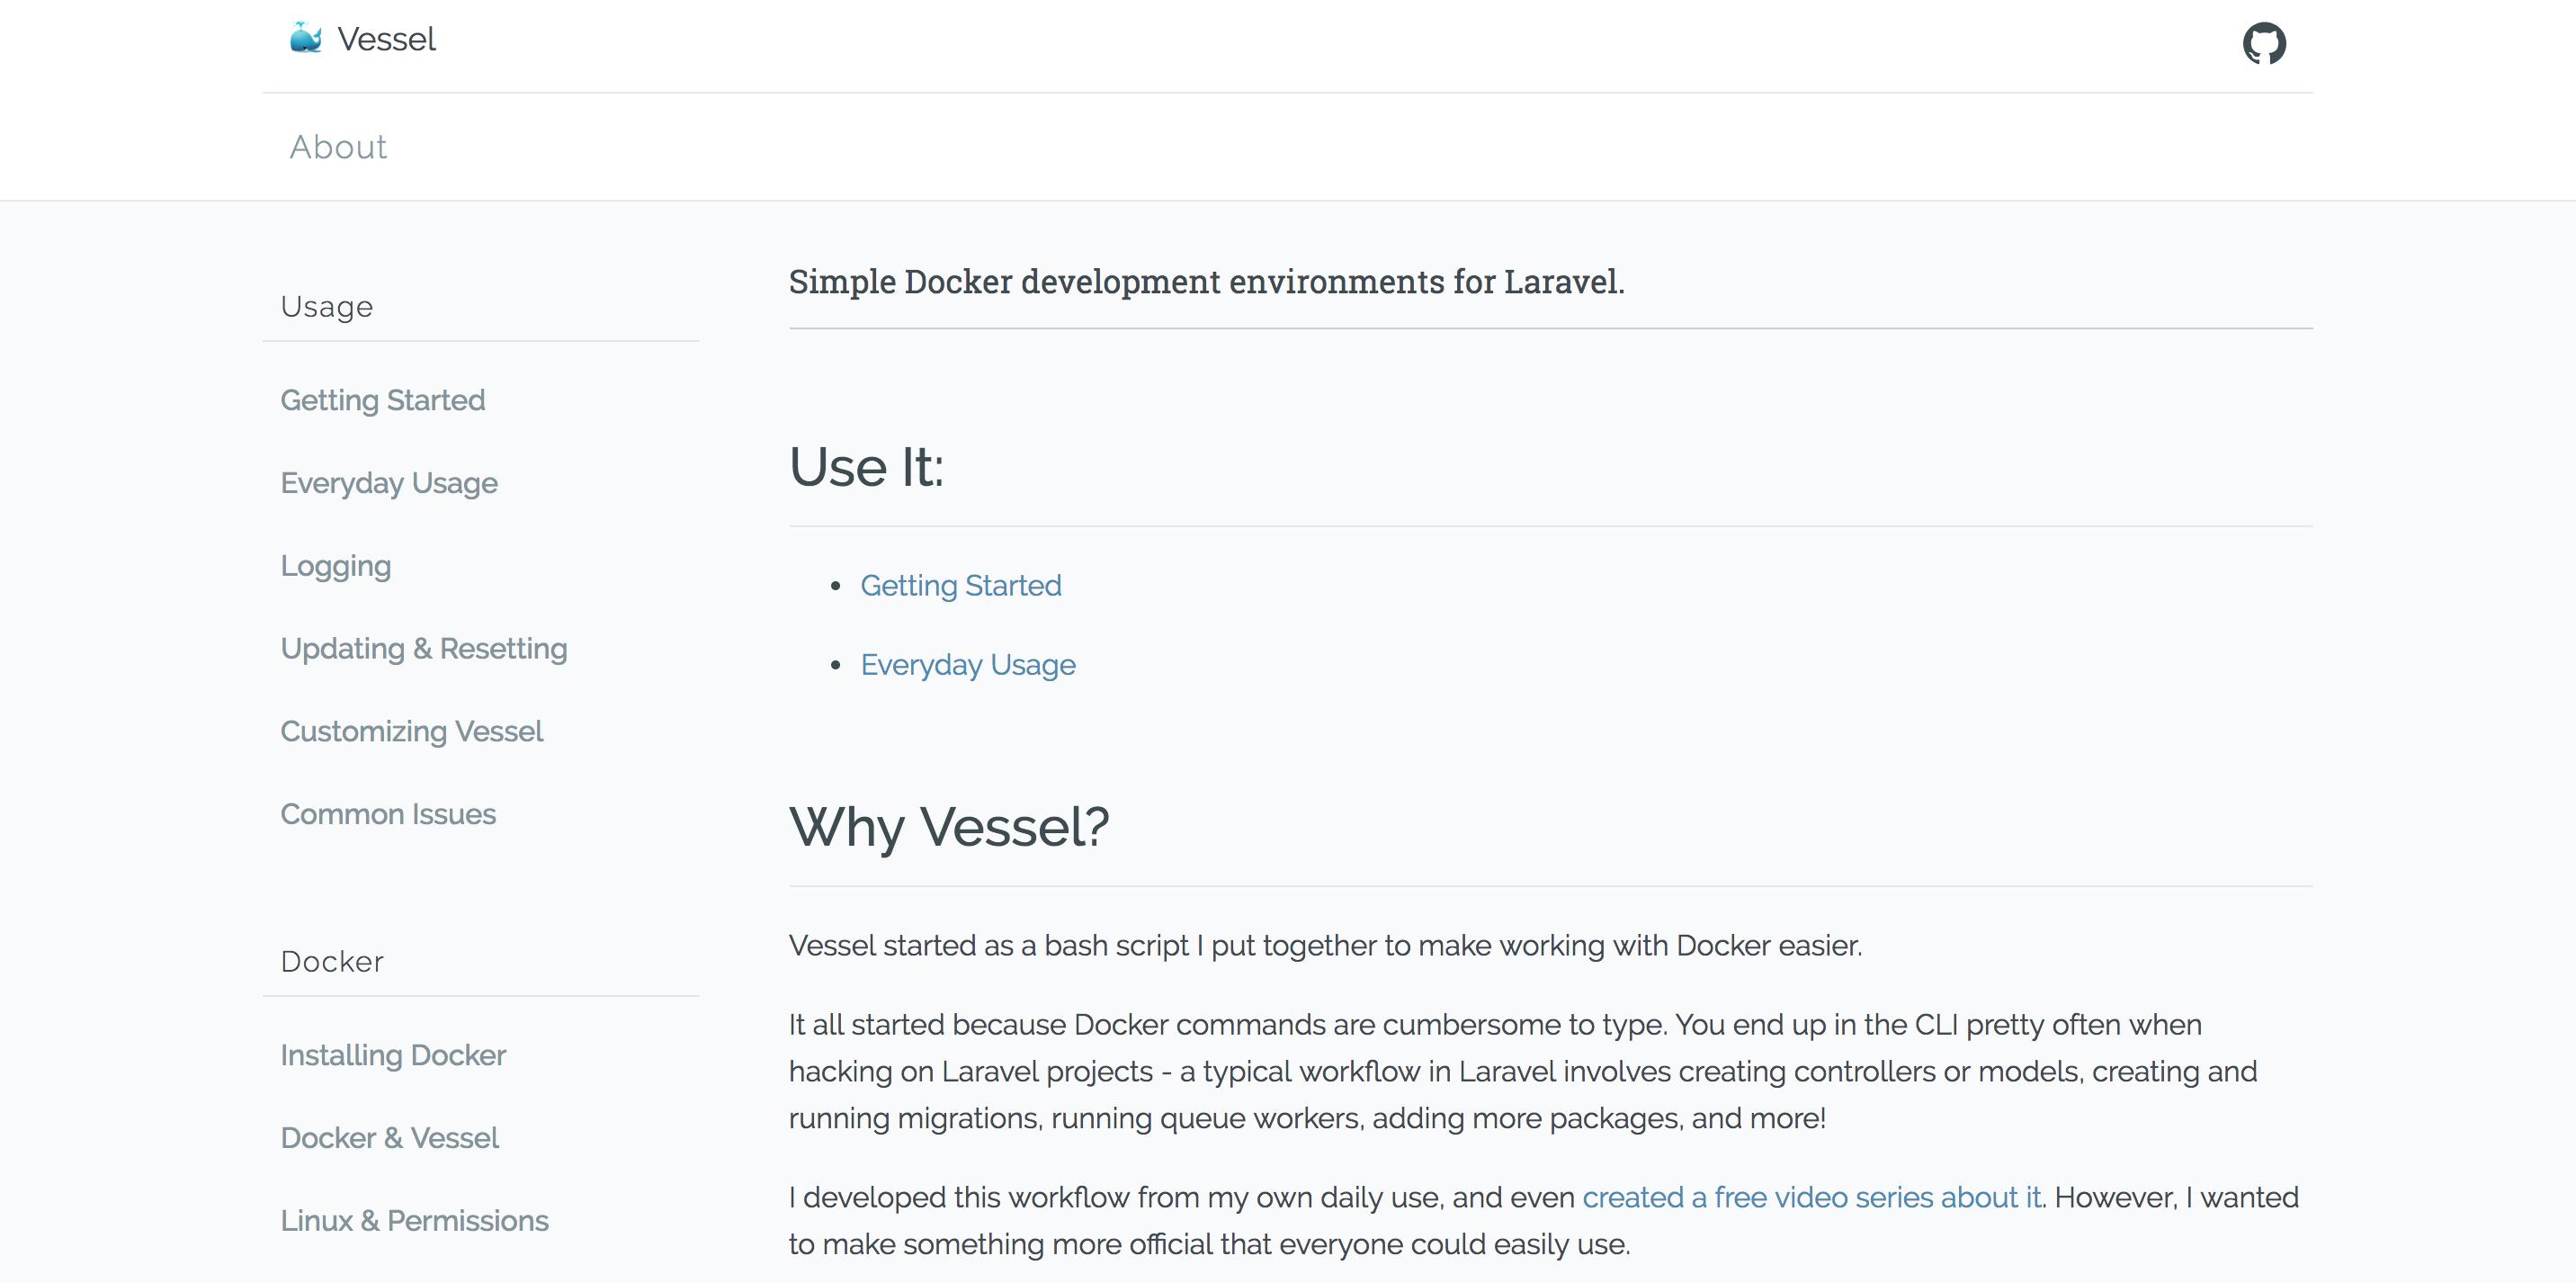 VesselでLaravelのDocker環境をサクッと作る - Qiita